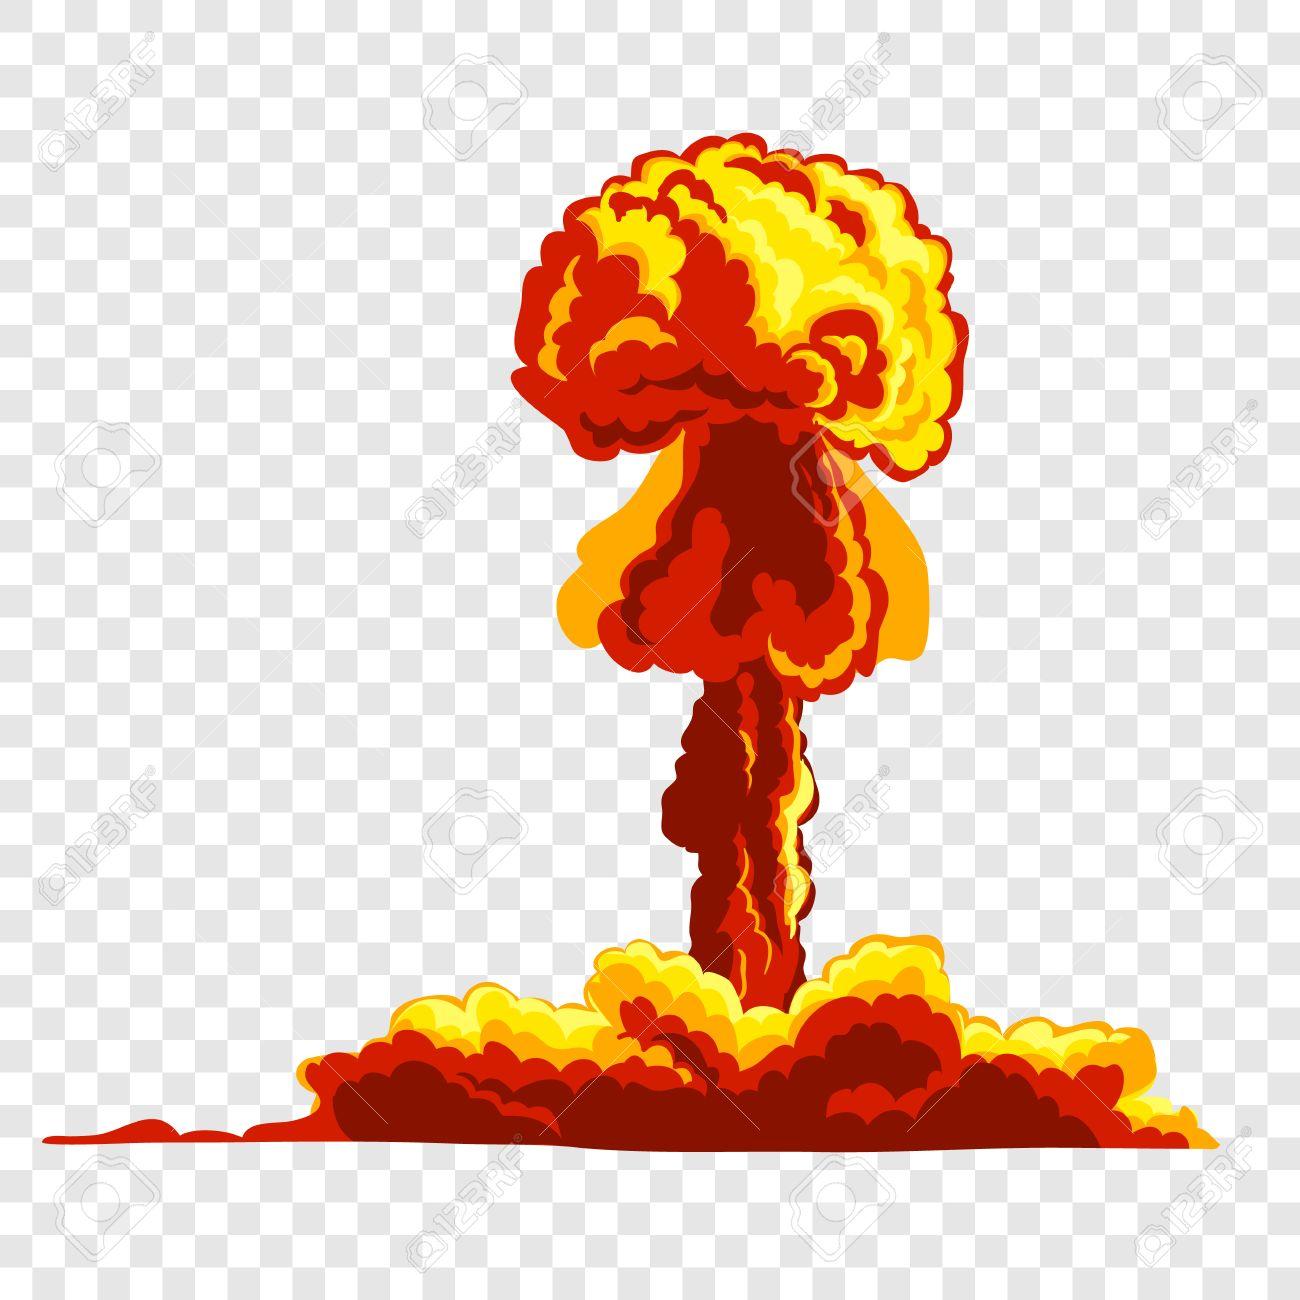 Mushroom cloud. Orange and red illustration on transparent background - 51730523